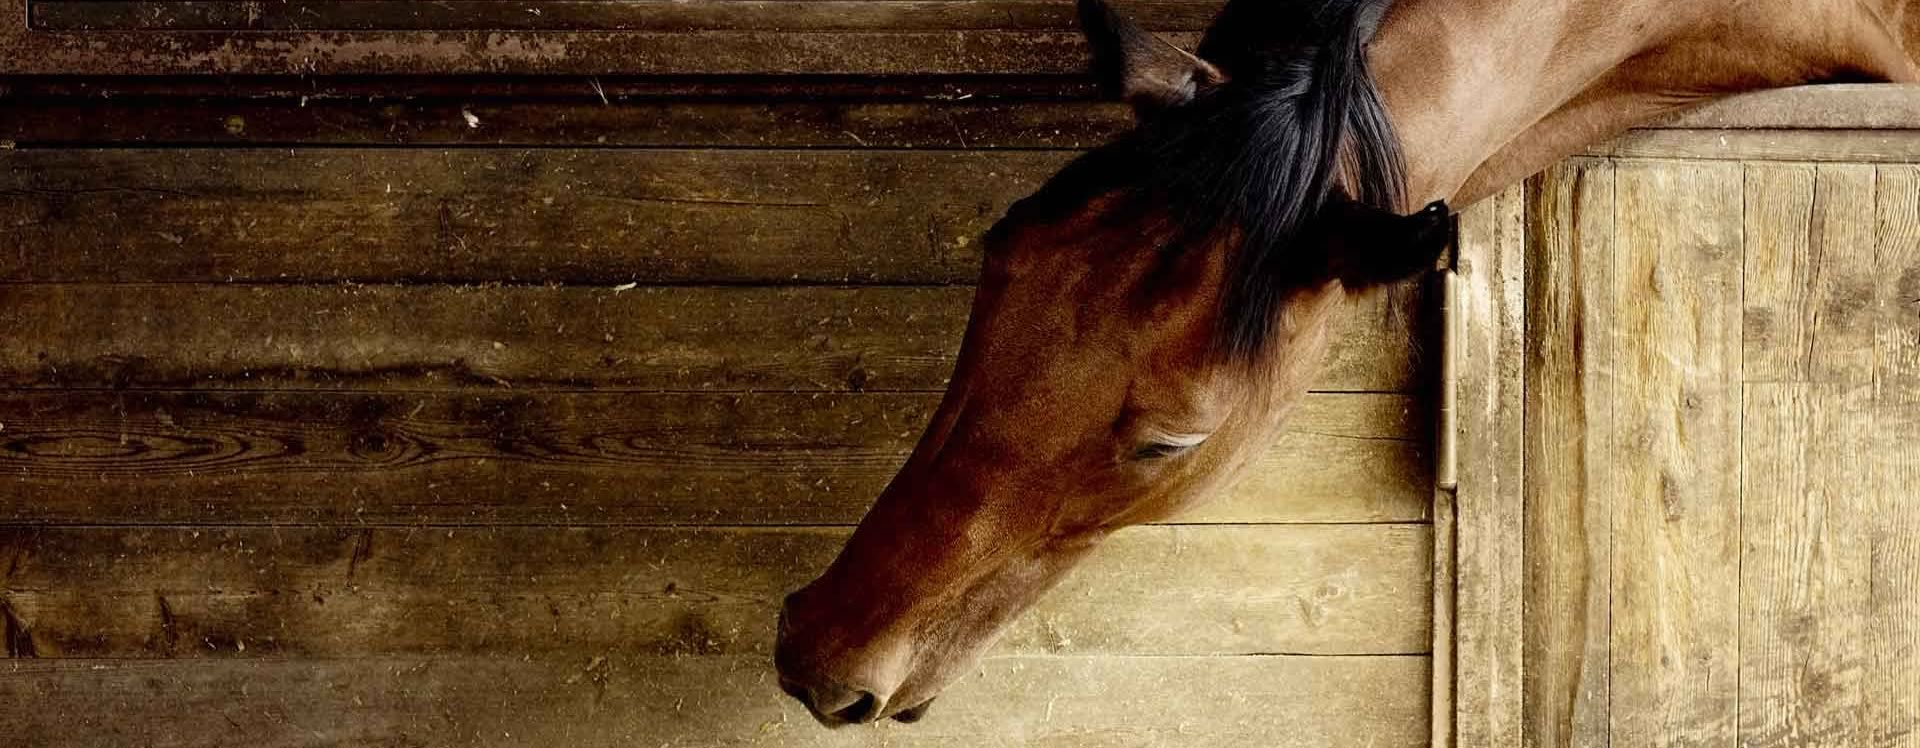 Porrini Franco ecommerce mangimi per cavalli